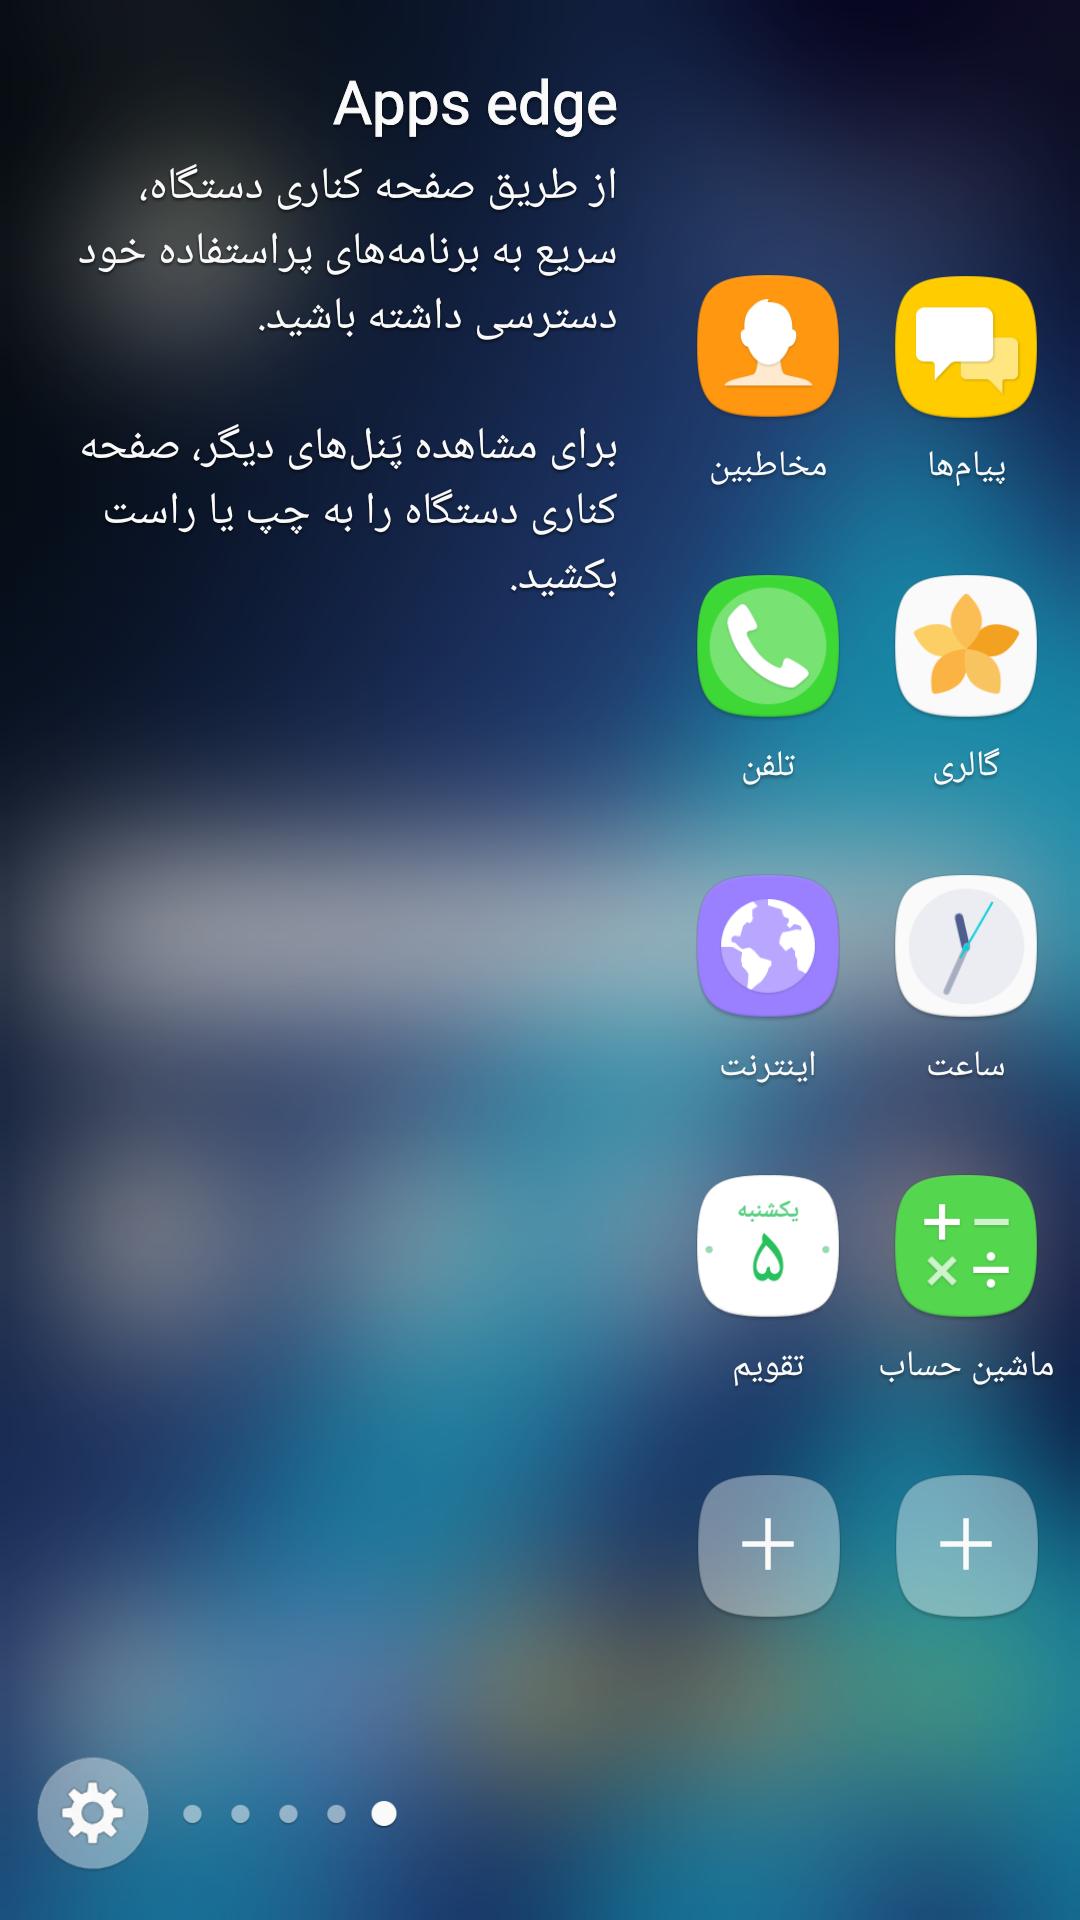 Screenshot_۲۰۱۷۰۳۰۵-۱۱۴۱۵۹